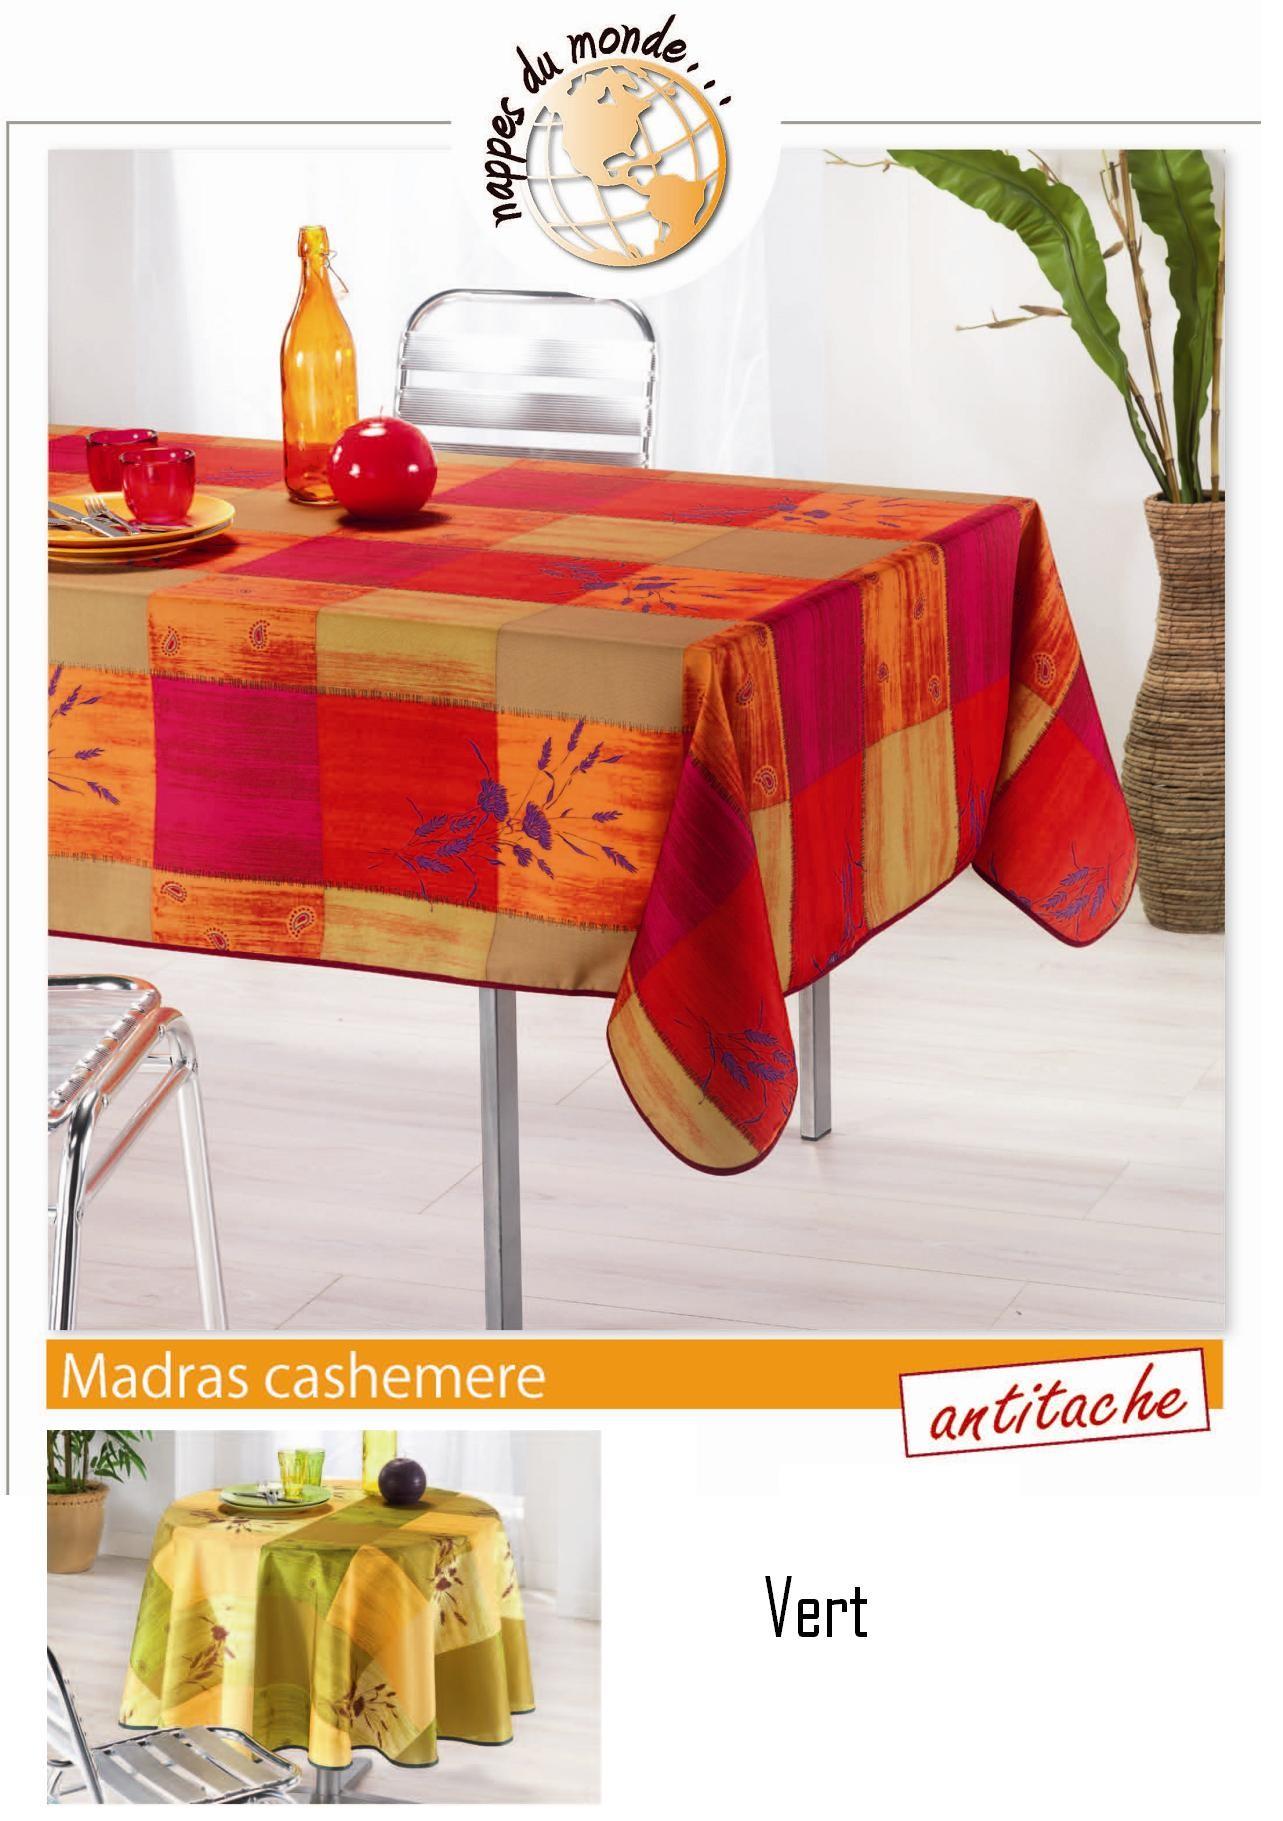 nappe carr e madras cashemire vert jaune. Black Bedroom Furniture Sets. Home Design Ideas